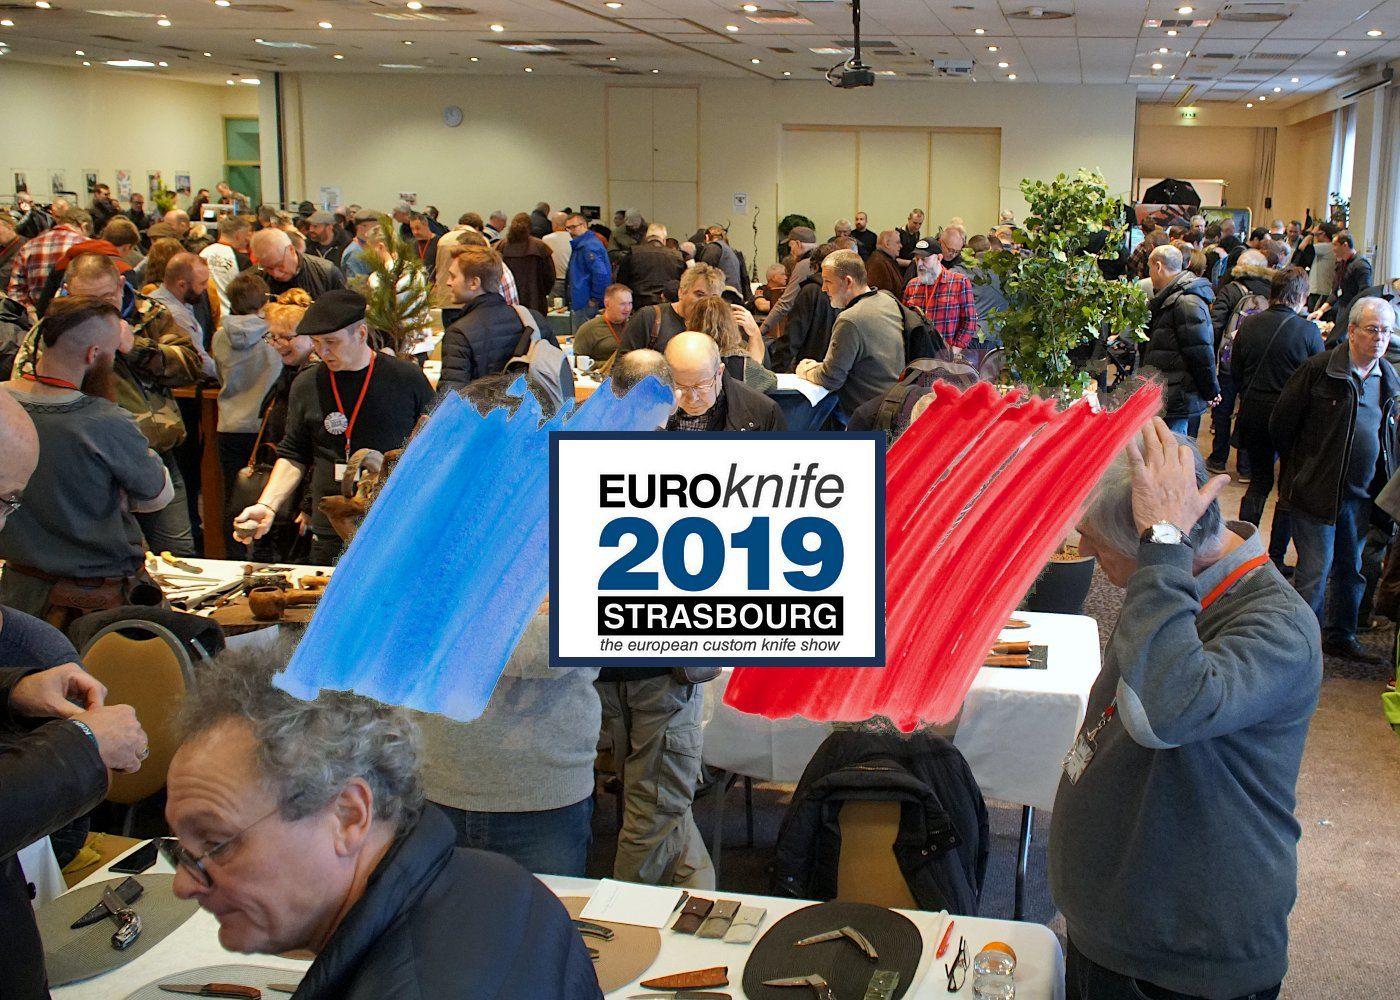 EuroKnife 2019 - Messerausstellung in Straßburg 1